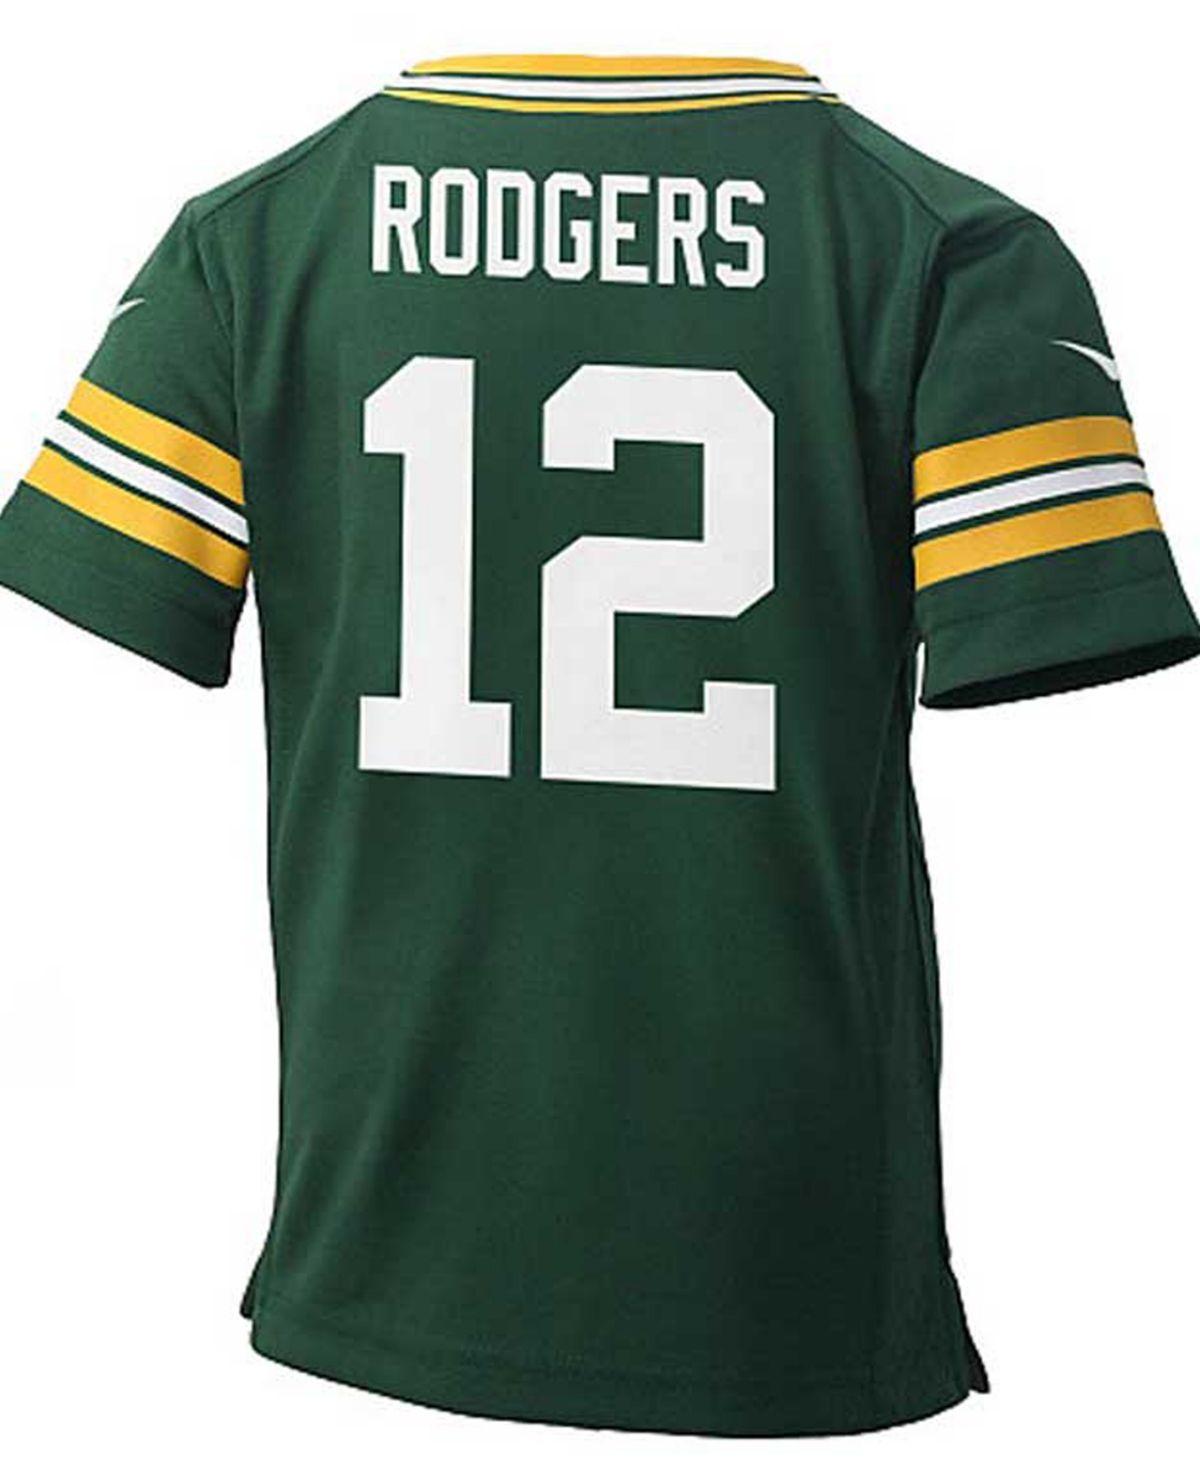 Nike Baby Aaron Rodgers Green Bay Packers Jersey Reviews Sports Fan Shop By Lids Men Macy S Green Bay Packers Jerseys Rodgers Green Bay Green Bay Packers